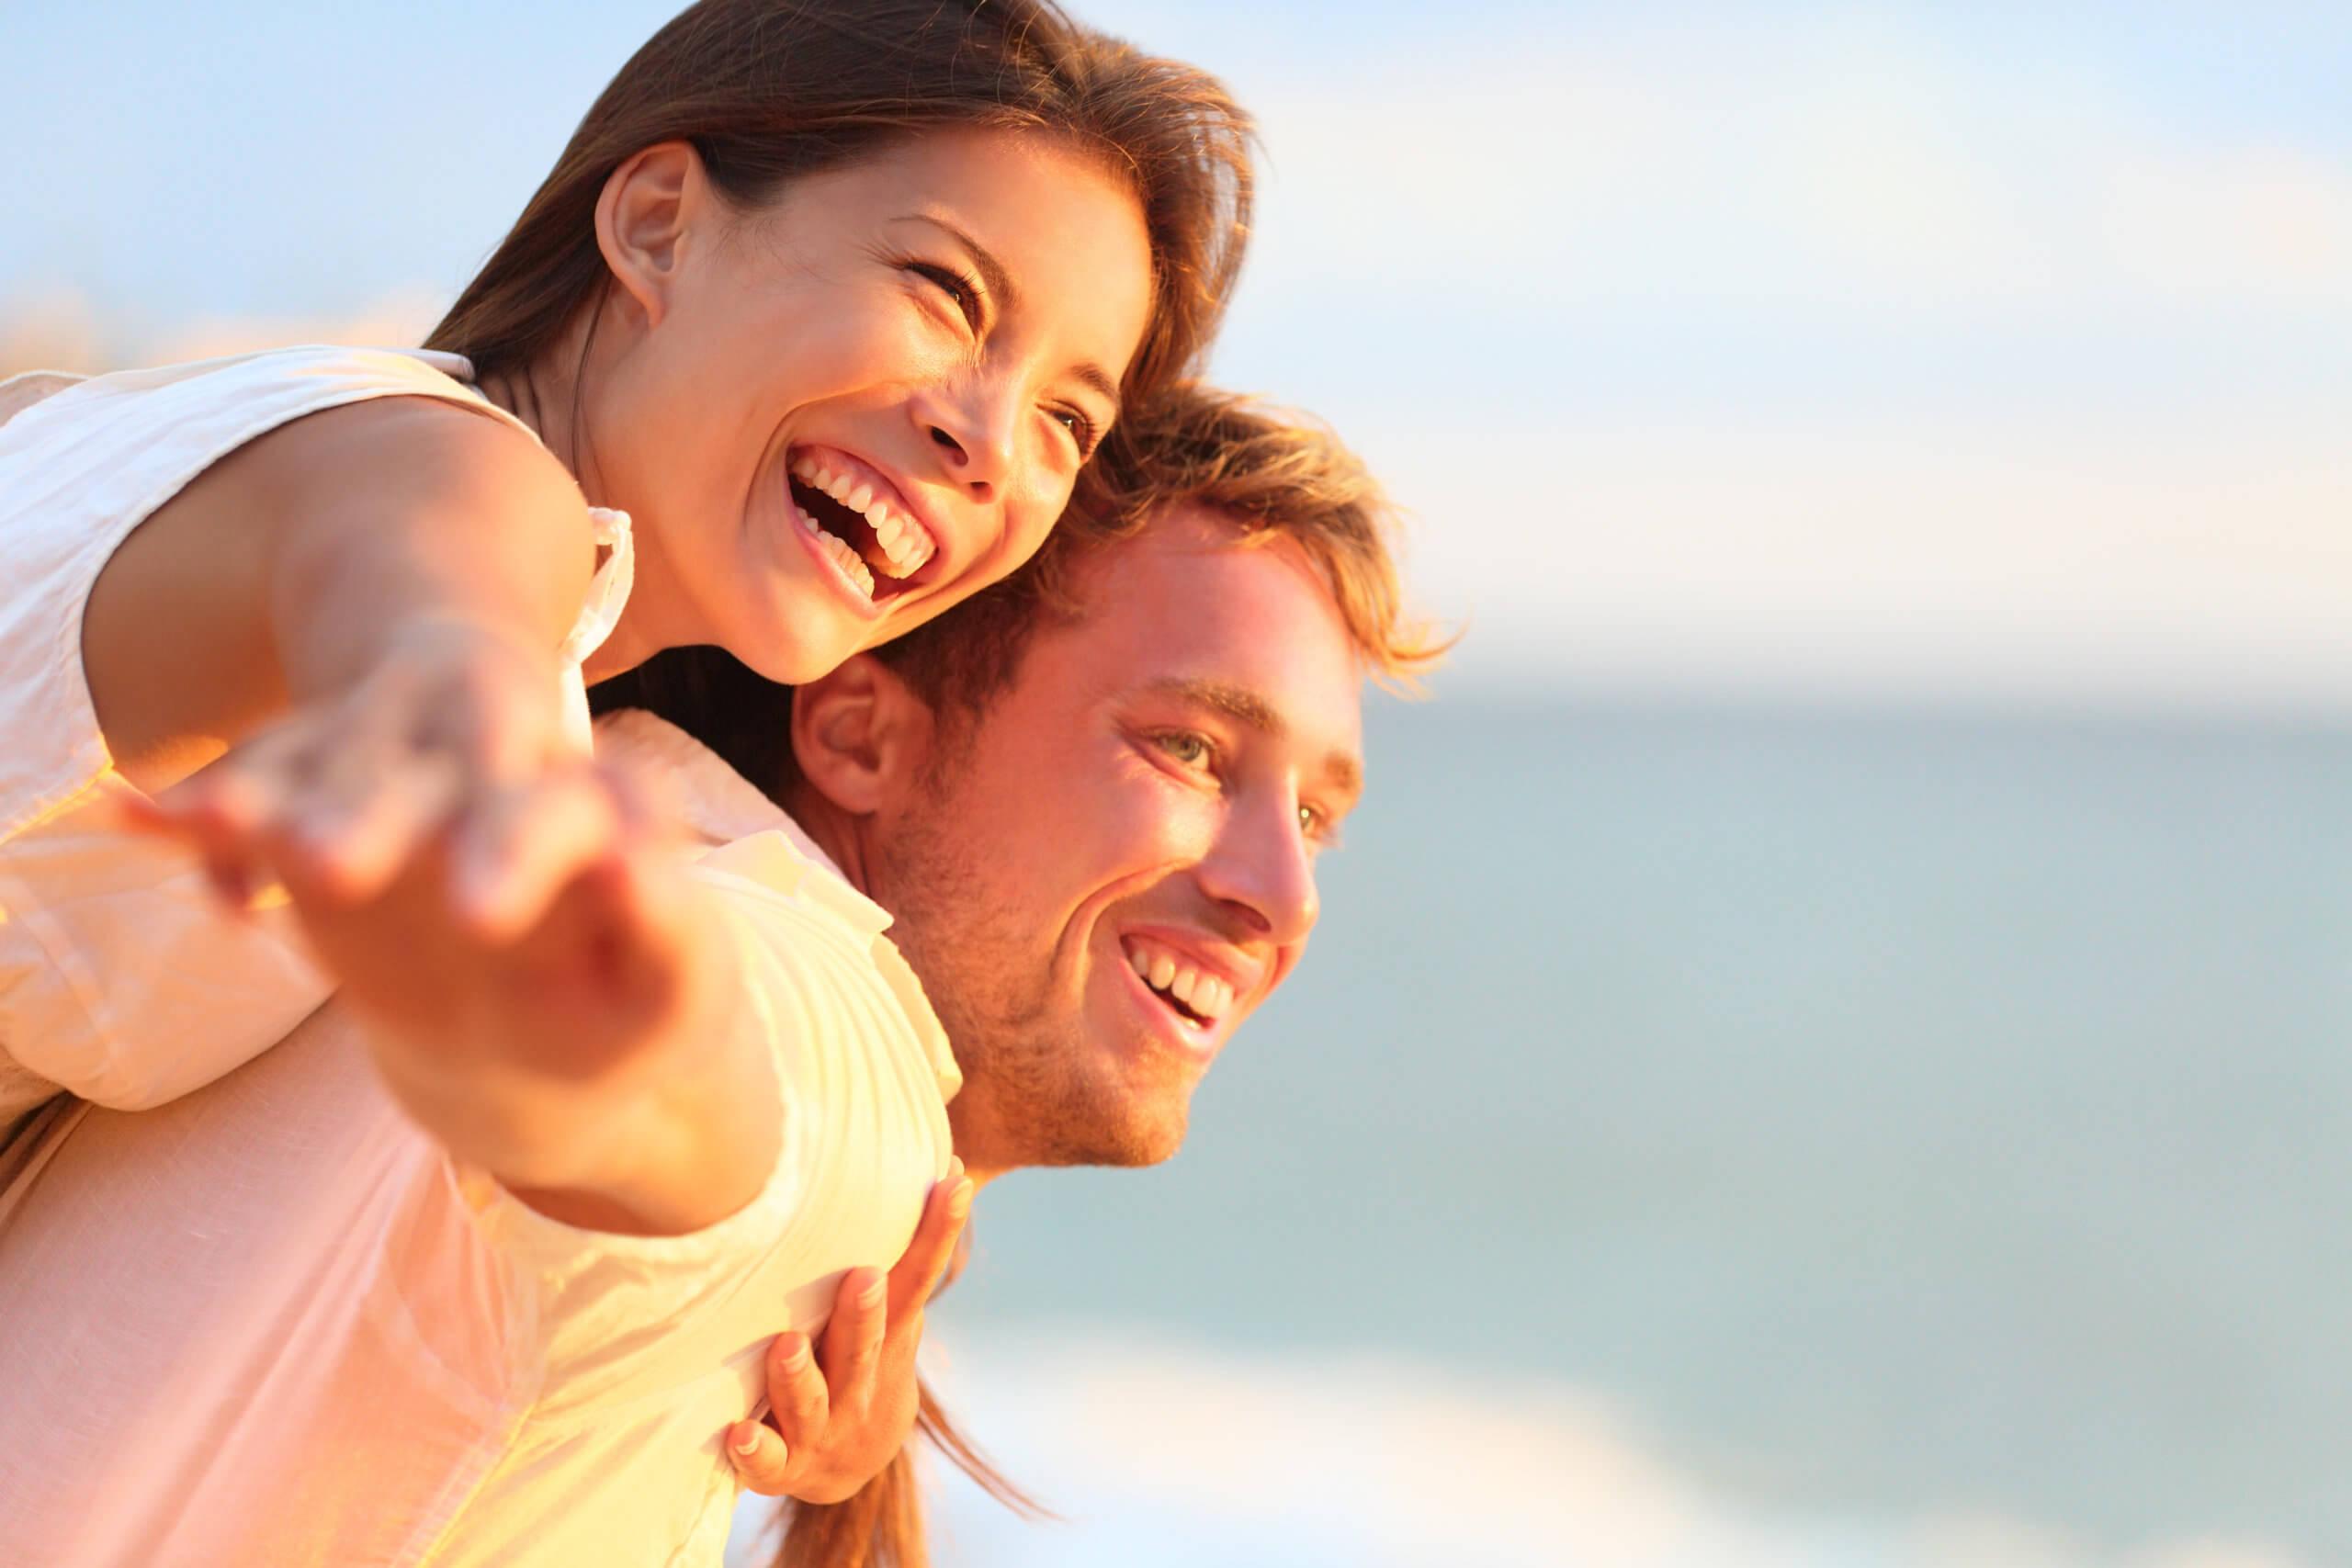 Beach,Couple,Laughing,In,Love,Romance,On,Travel,Honeymoon,Vacation